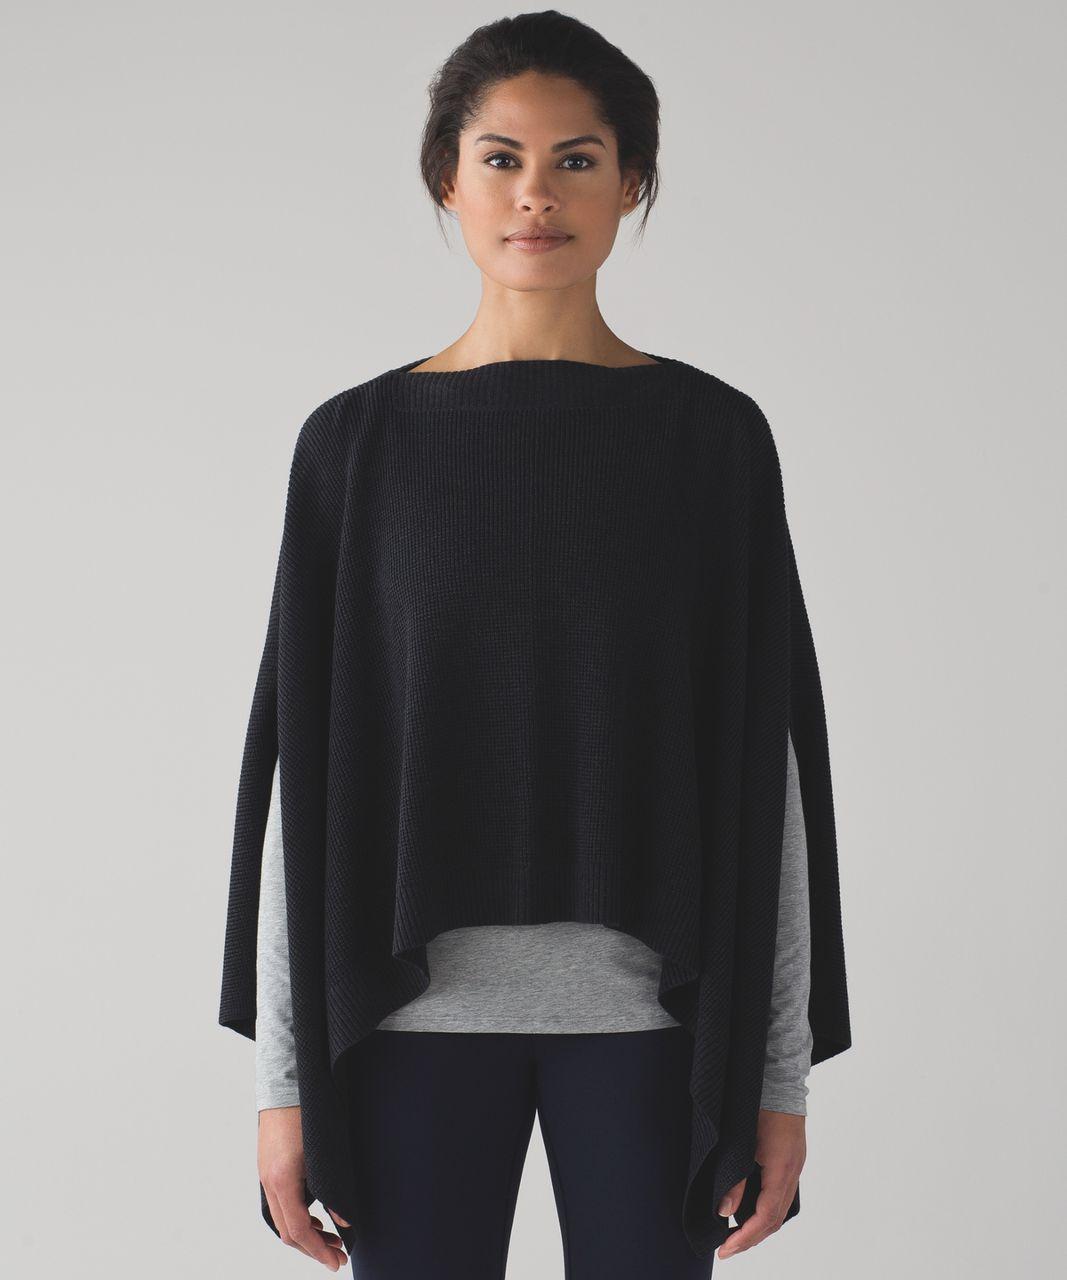 Lululemon Forward Flow Cape - Heathered Black